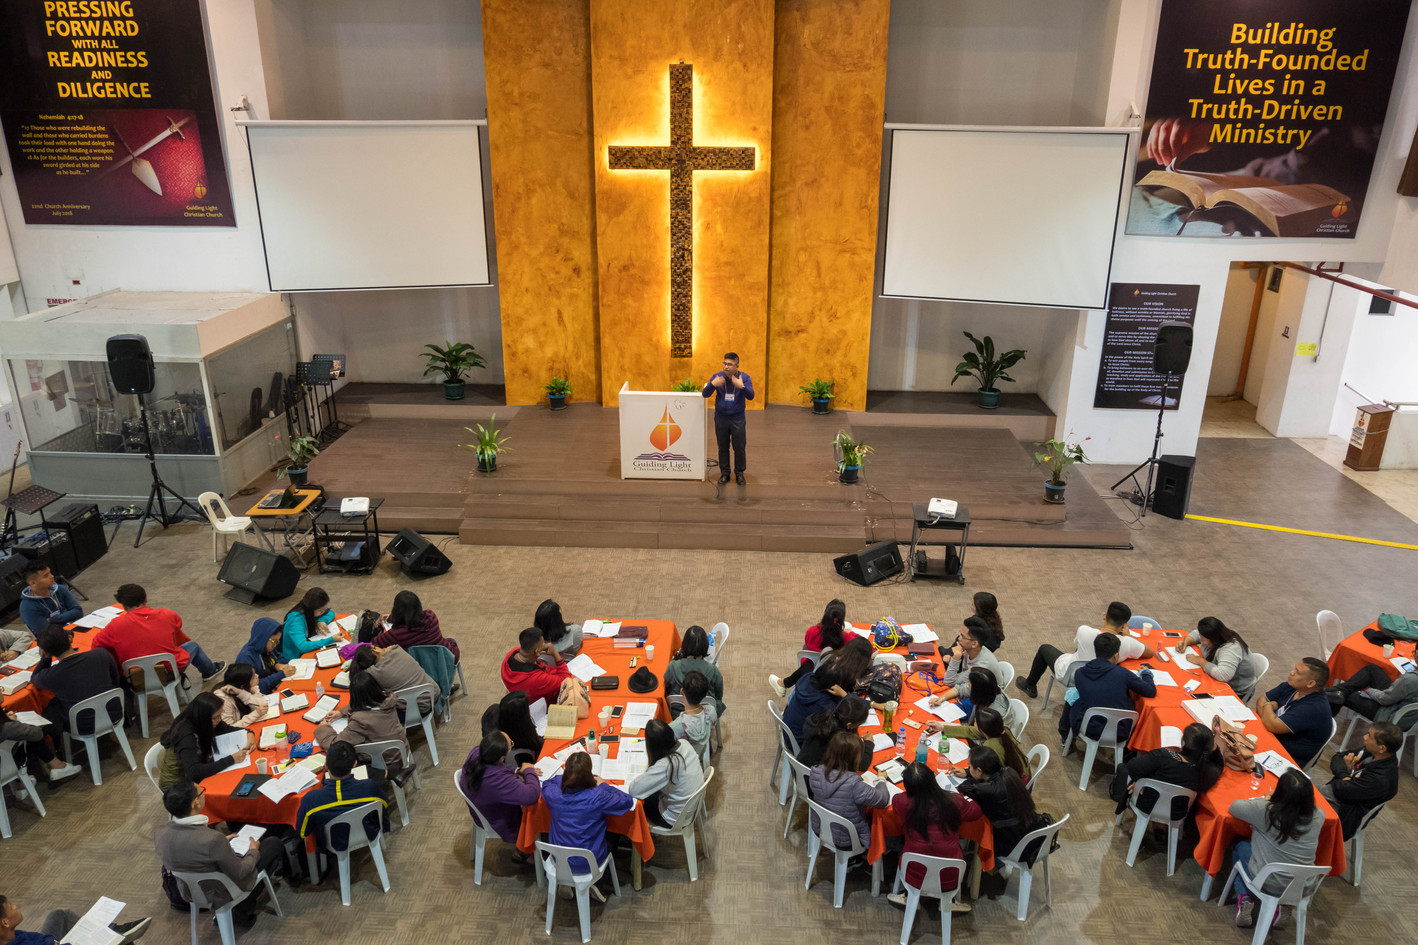 Bro. Tabs de Jesus Preaching the First Plenary